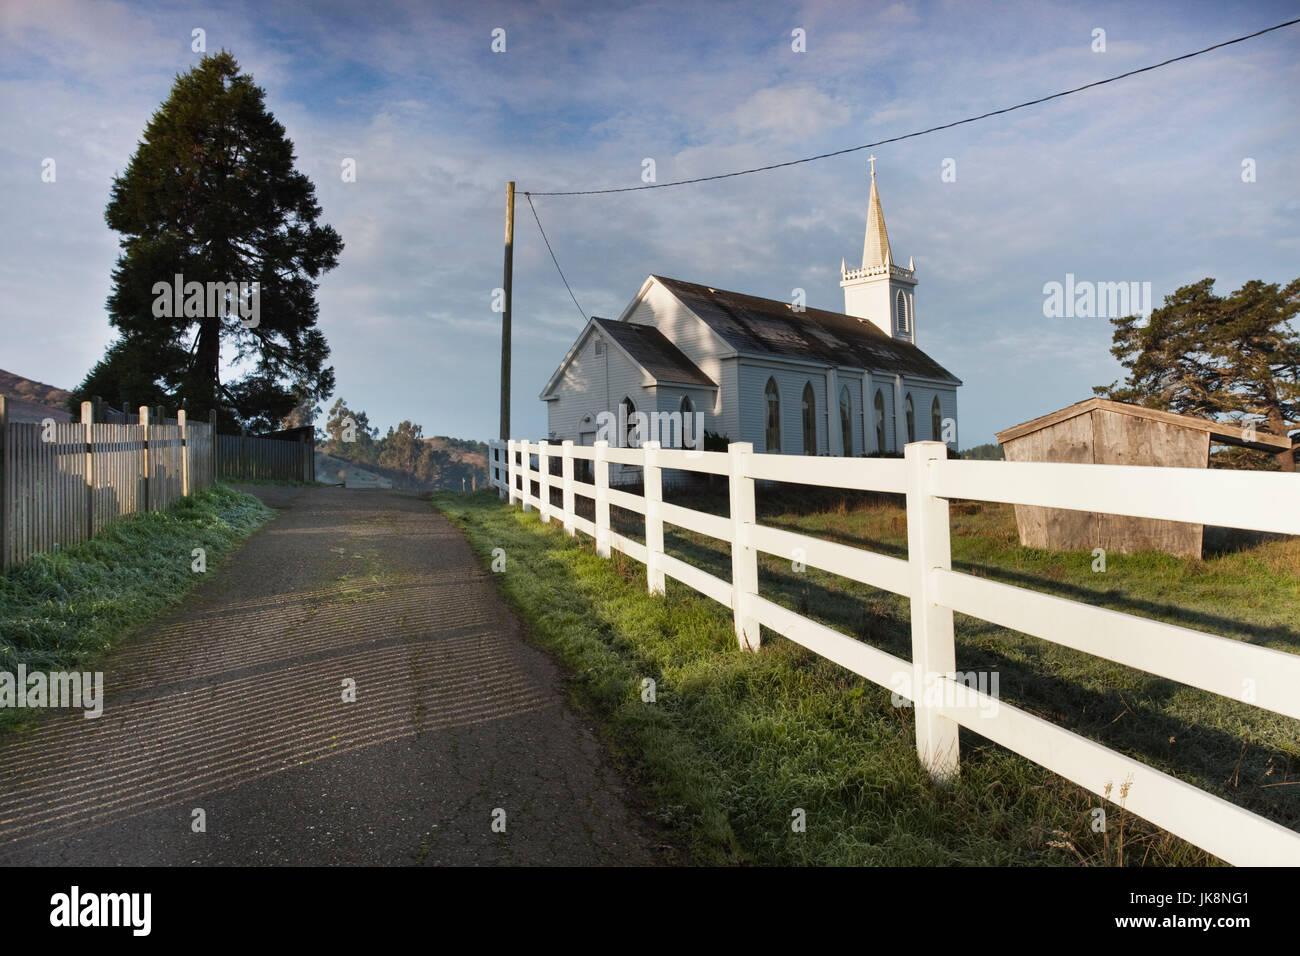 Church Usa Film Stock Photos & Church Usa Film Stock Images